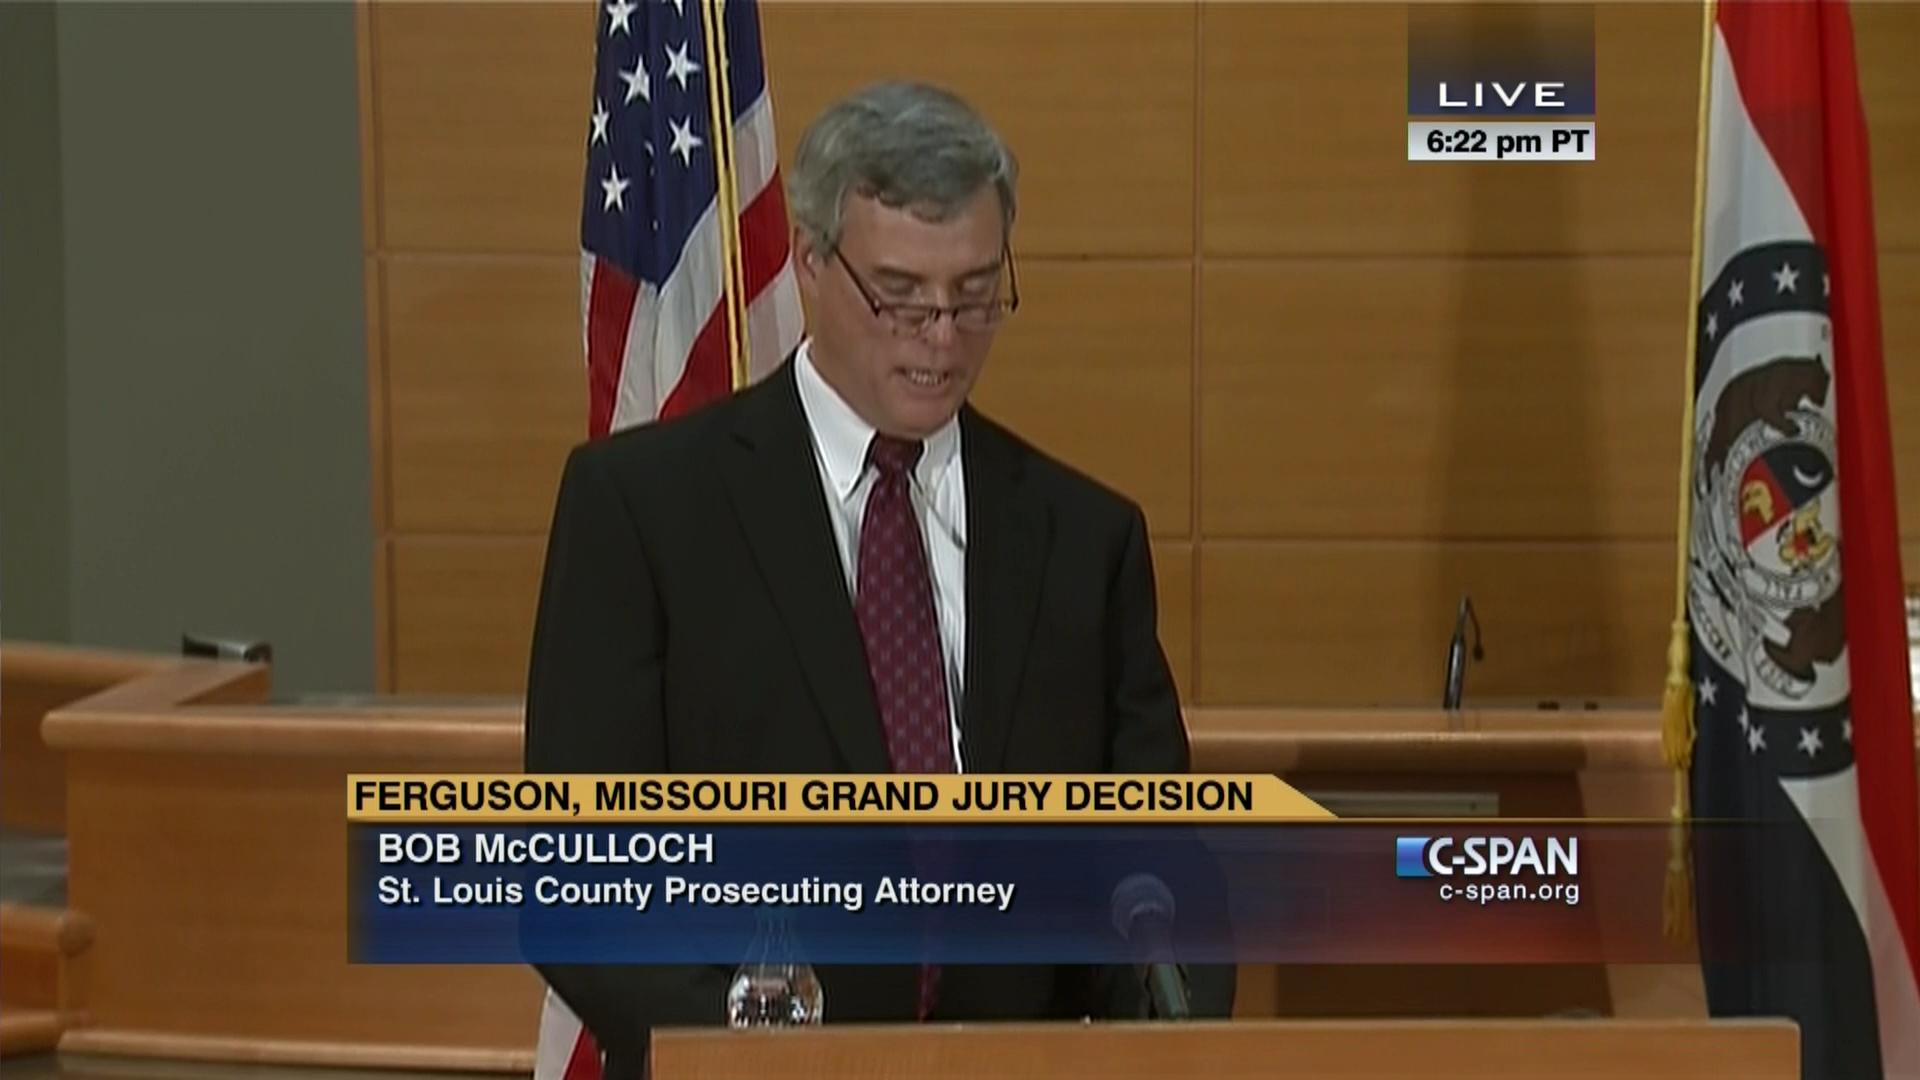 Ferguson Missouri Grand Jury Decision Announcement, Nov 24 2014   C ...